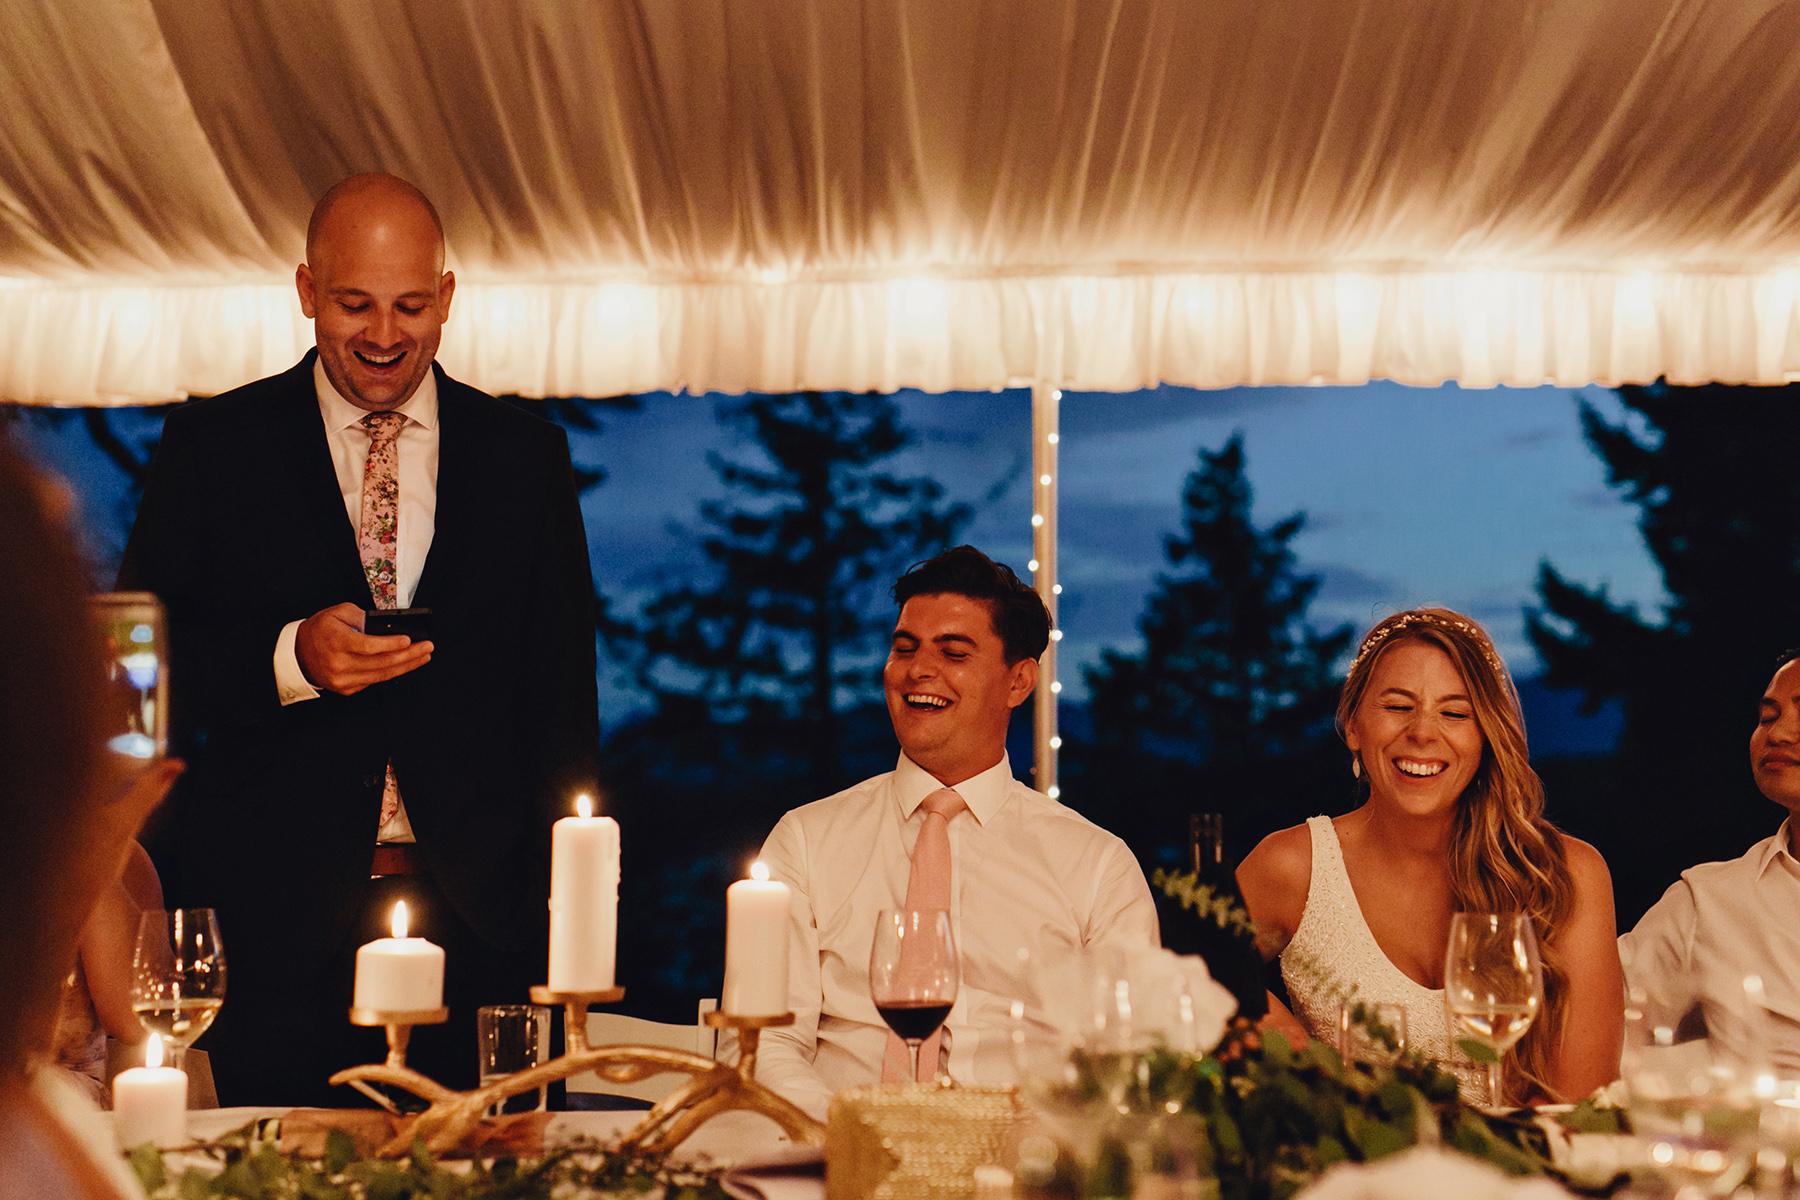 galiano-island-bodega-destination-wedding-0107.JPG